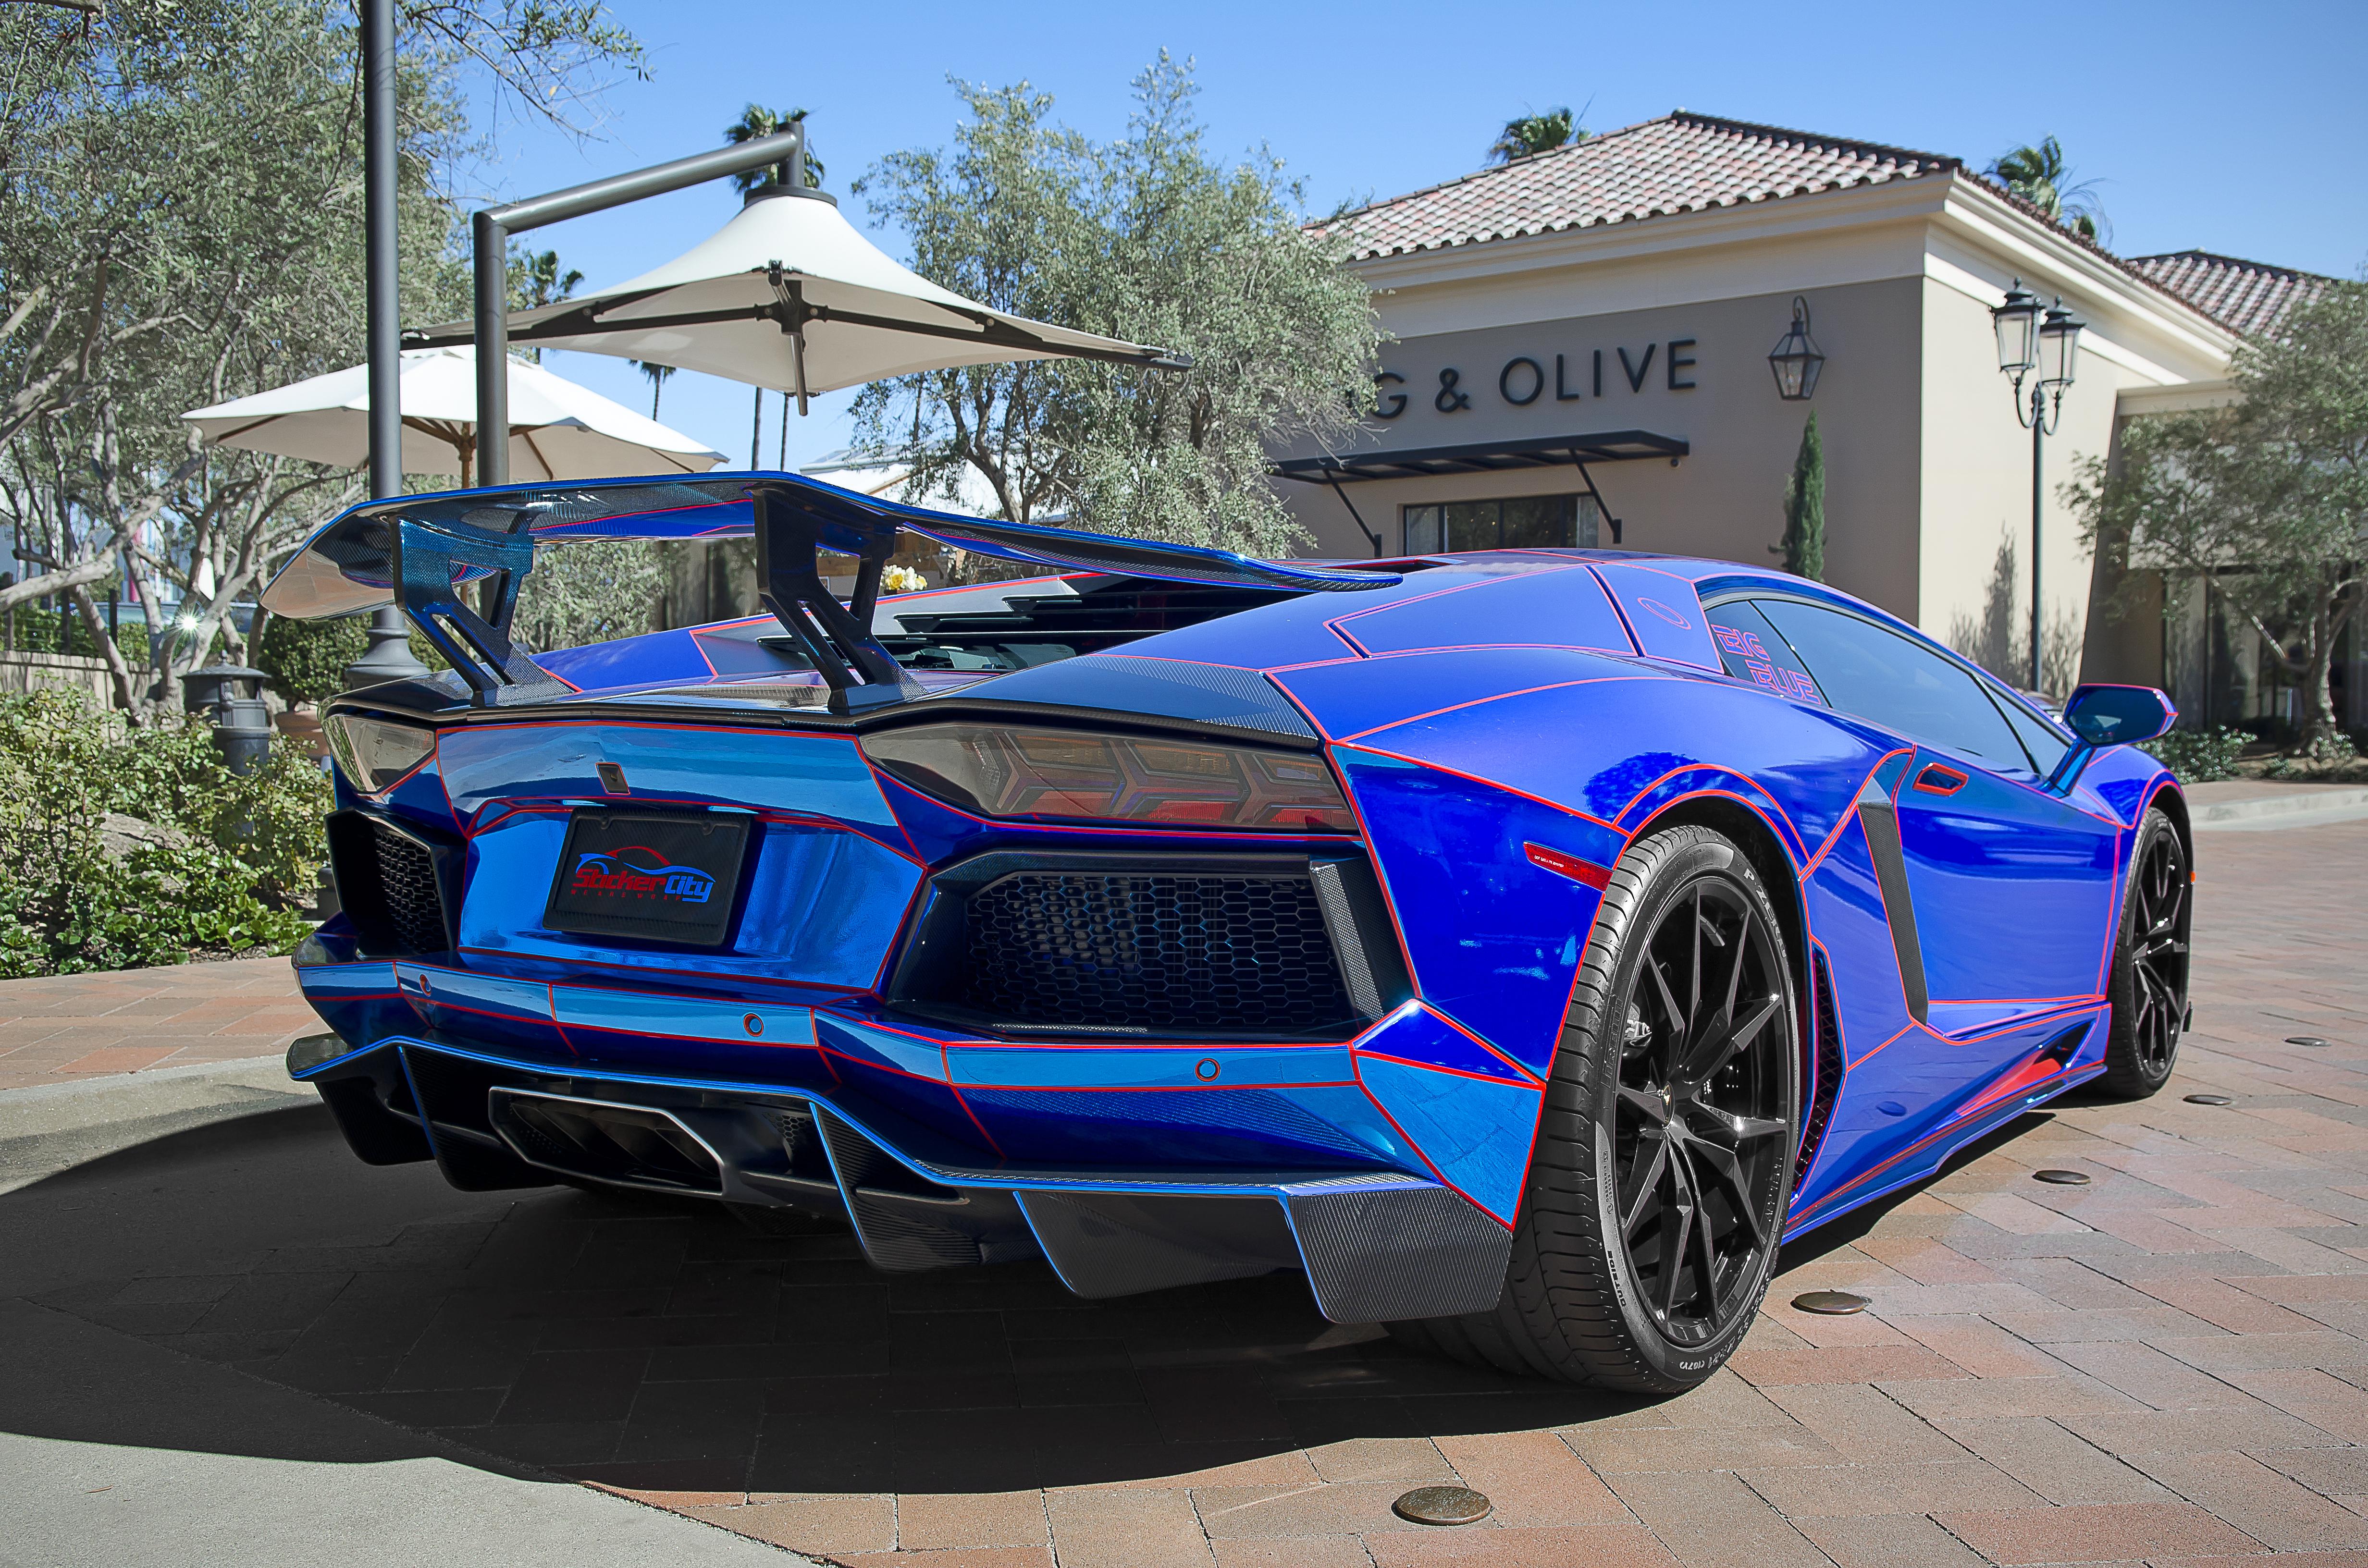 filechrome blue lamborghini aventador aka big blue 14560290813jpg - Lamborghini Aventador Blue Chrome